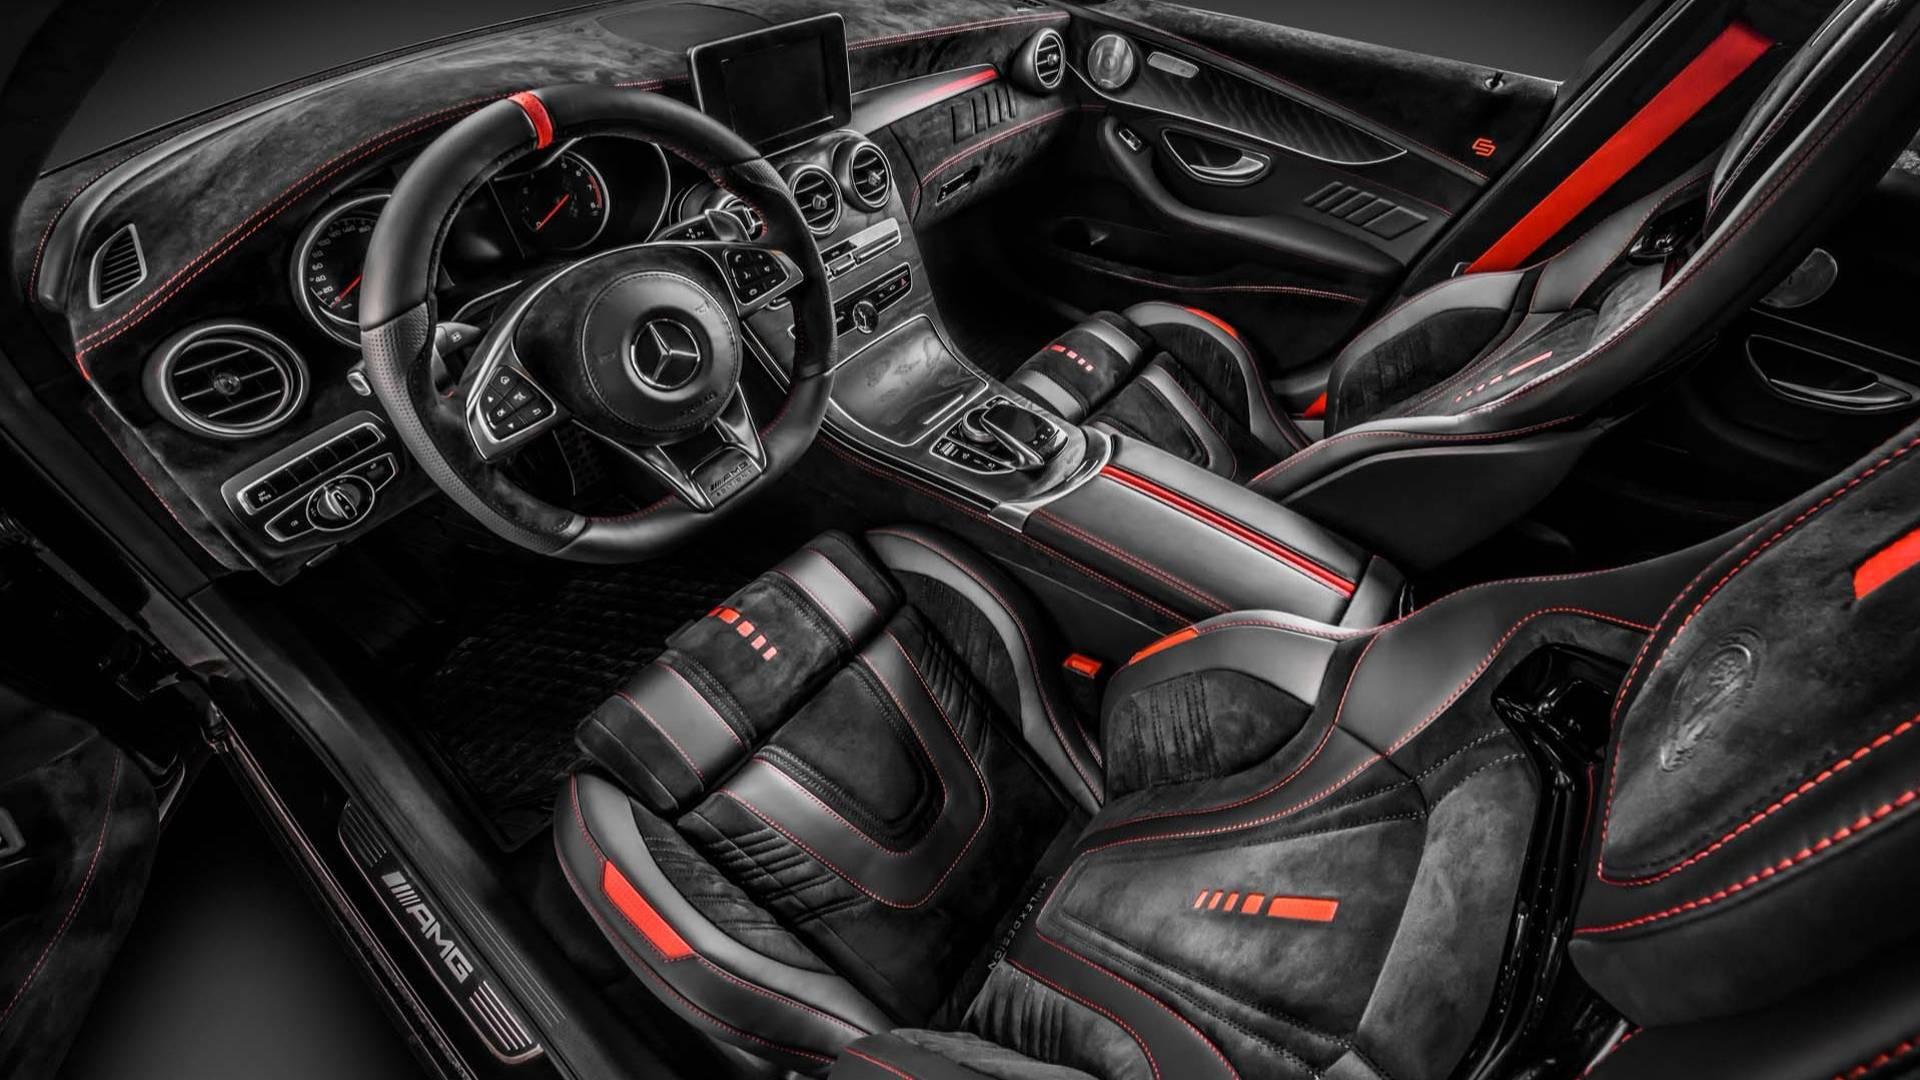 All Black Jeep Wrangler >> Carlex Design Kills a Mercedes-AMG C43 with Swathes of Alcantara - autoevolution